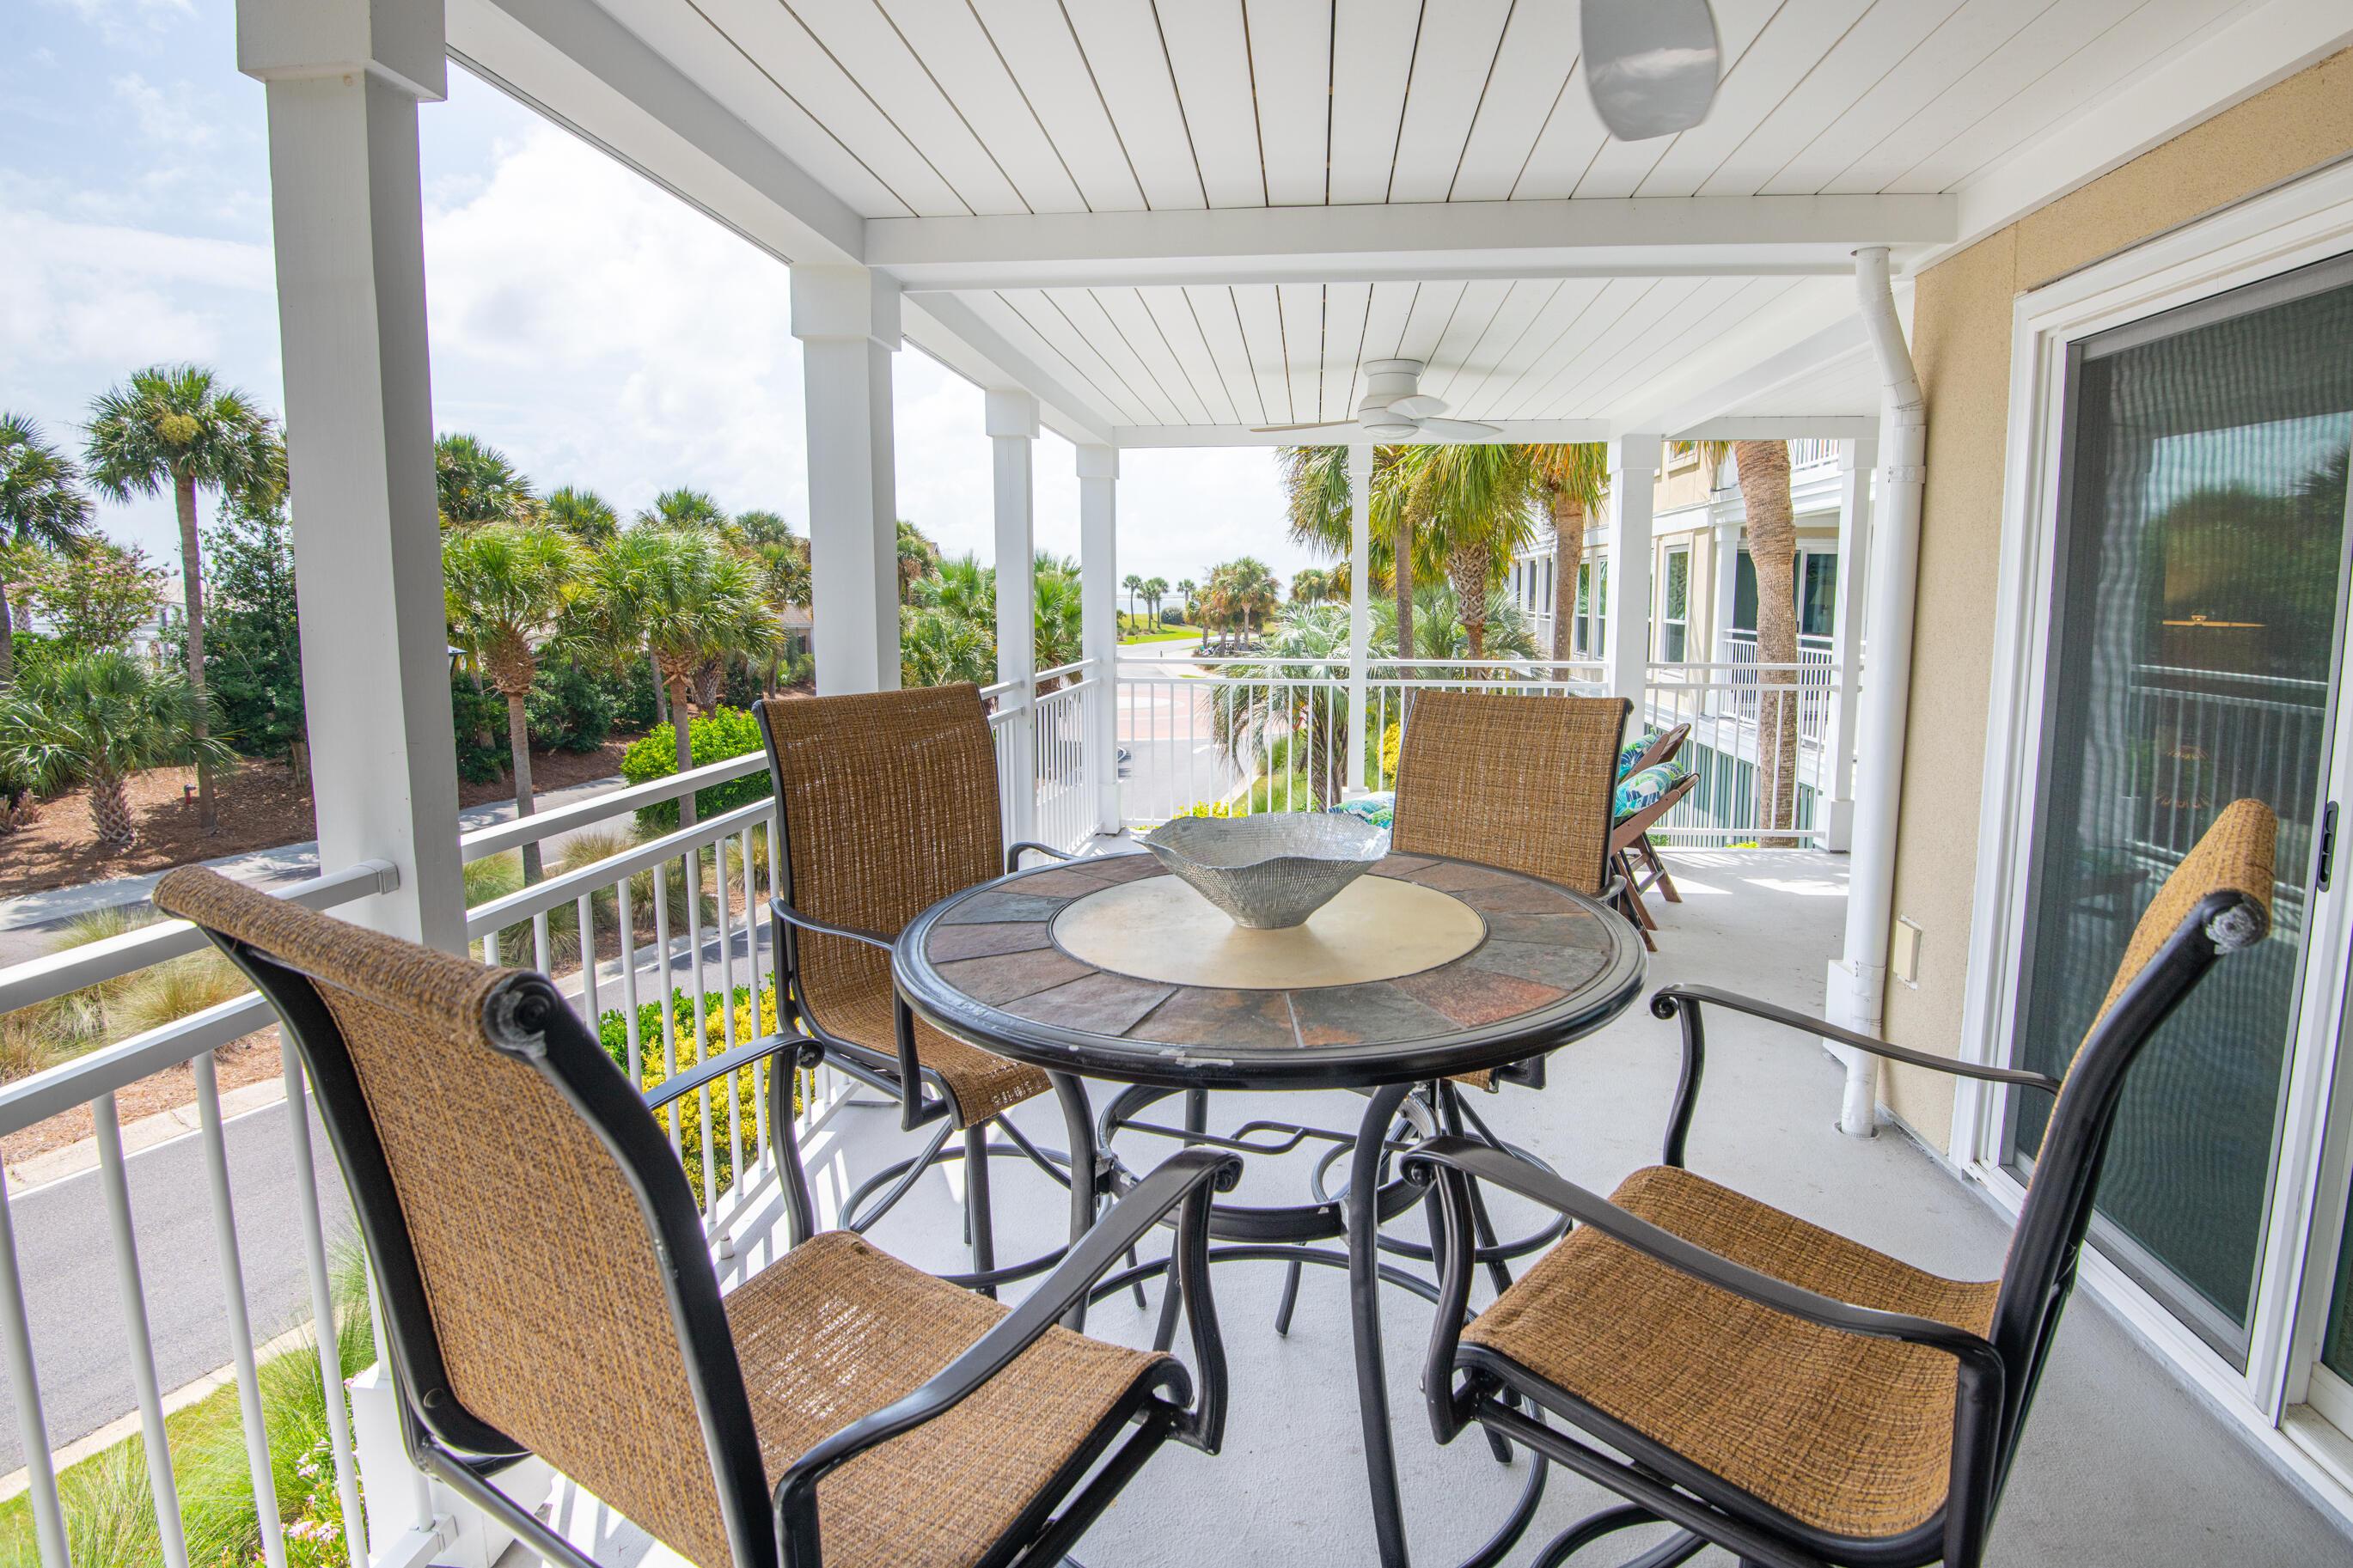 Atrium Villas Homes For Sale - 2935 Atrium Villa, Seabrook Island, SC - 2